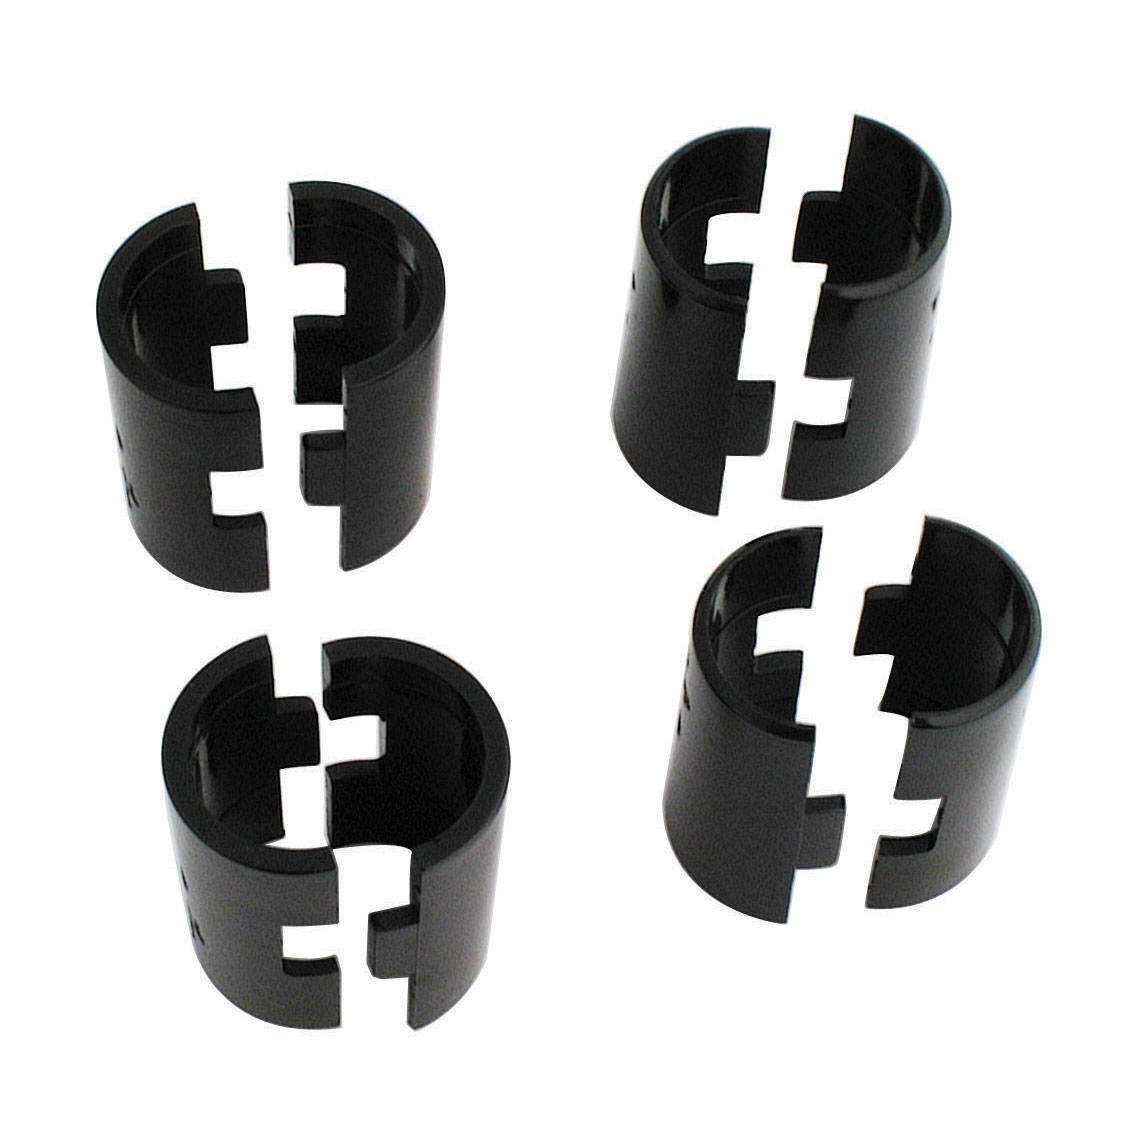 StoreIt 11200 Shelf Support Clips, Black